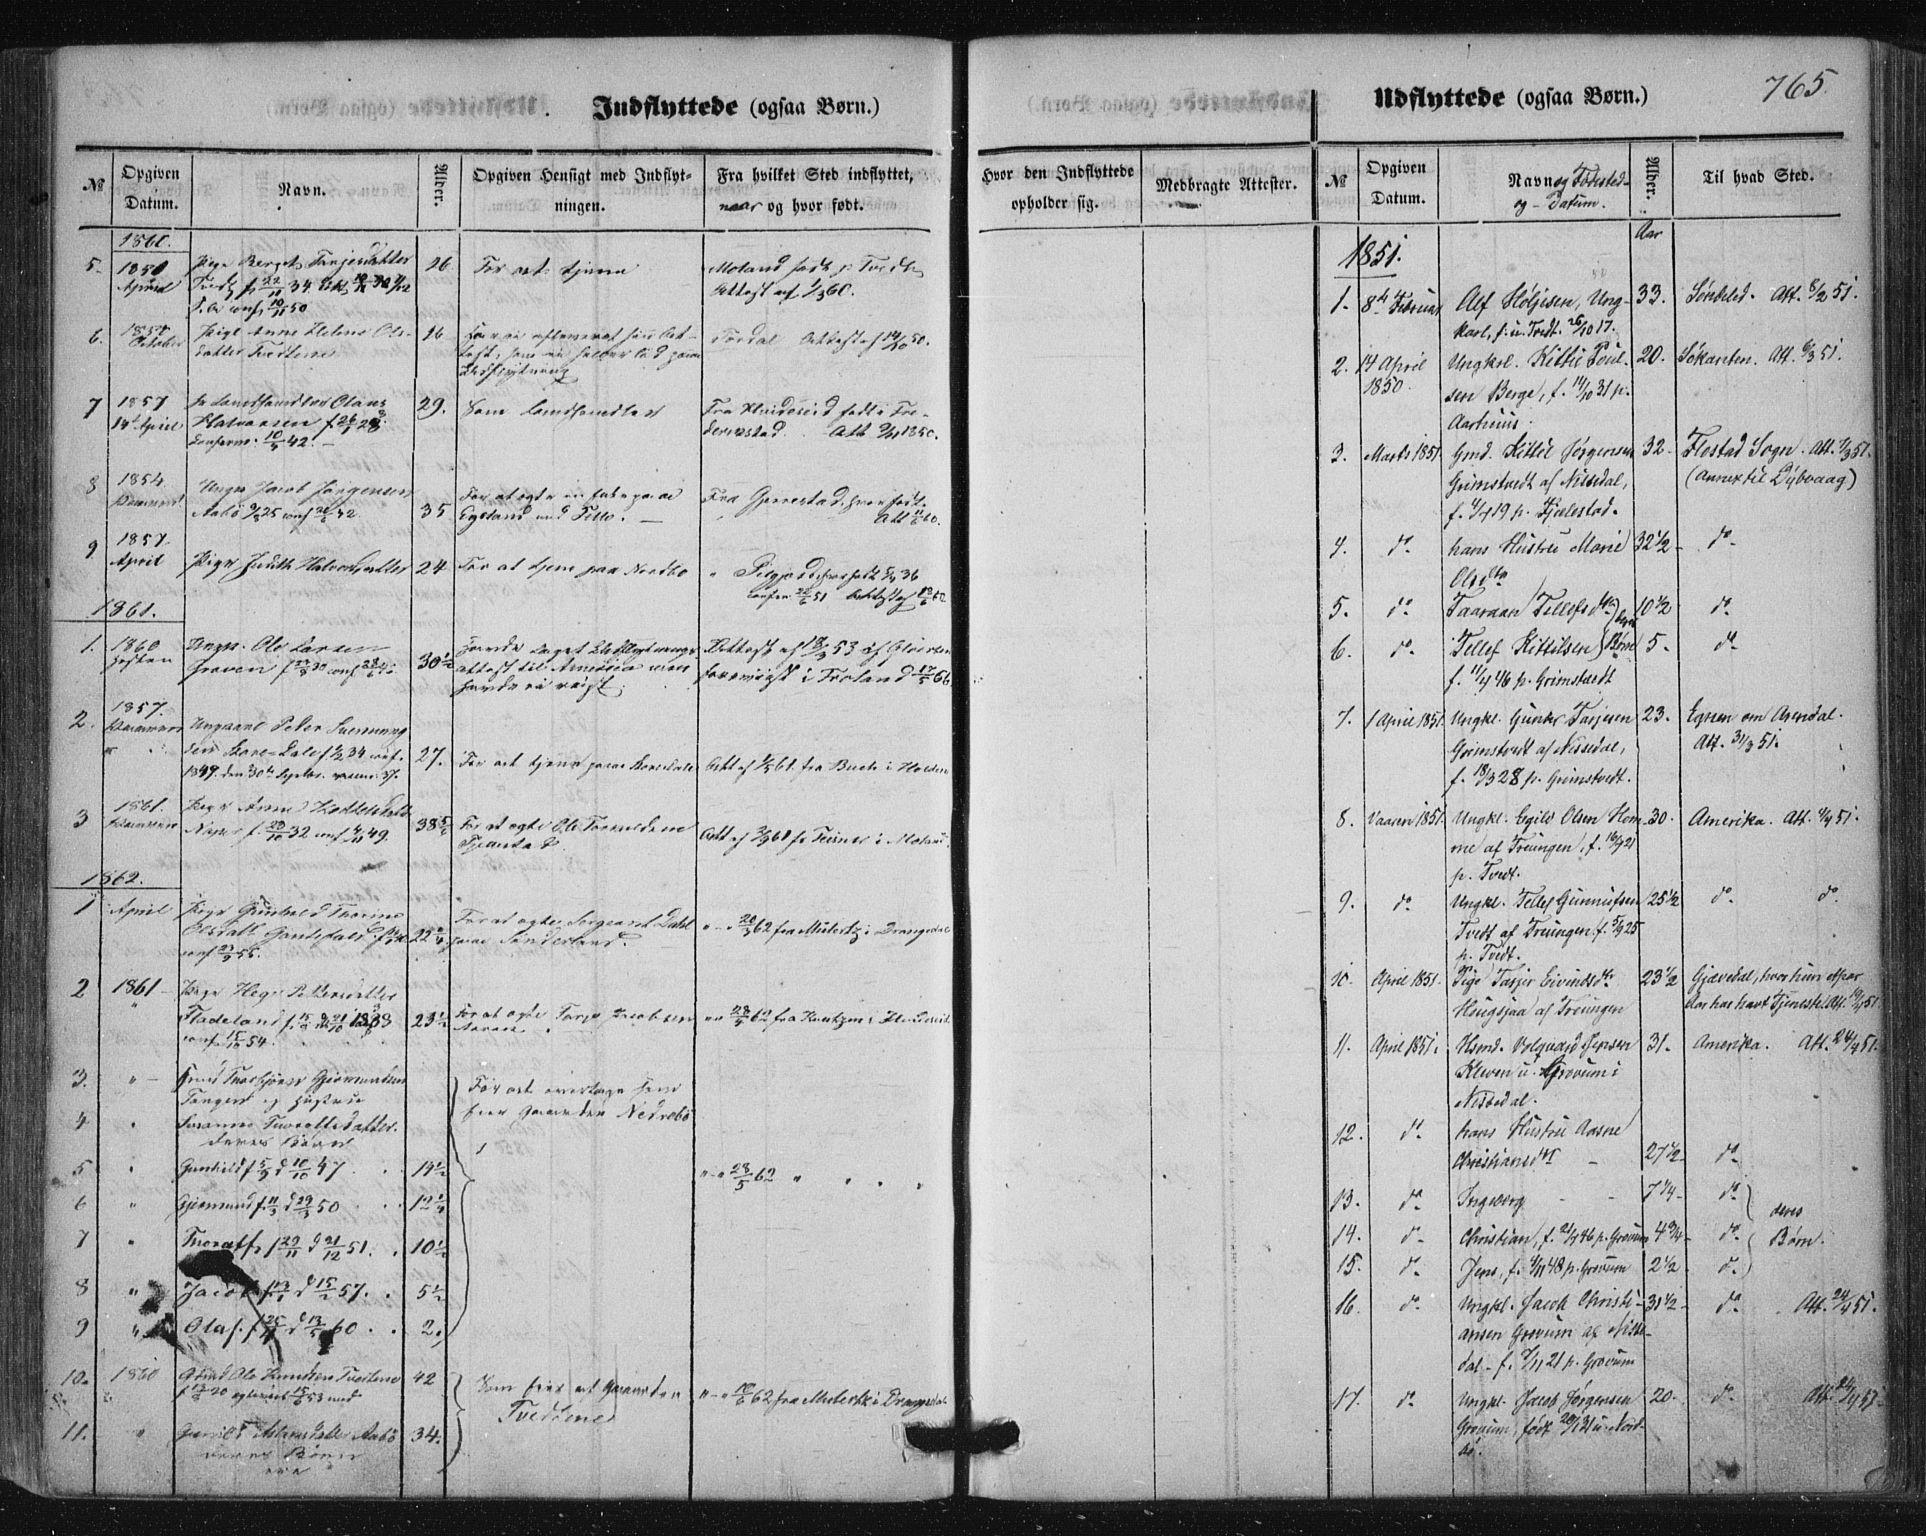 SAKO, Nissedal kirkebøker, F/Fa/L0003: Ministerialbok nr. I 3, 1846-1870, s. 764-765